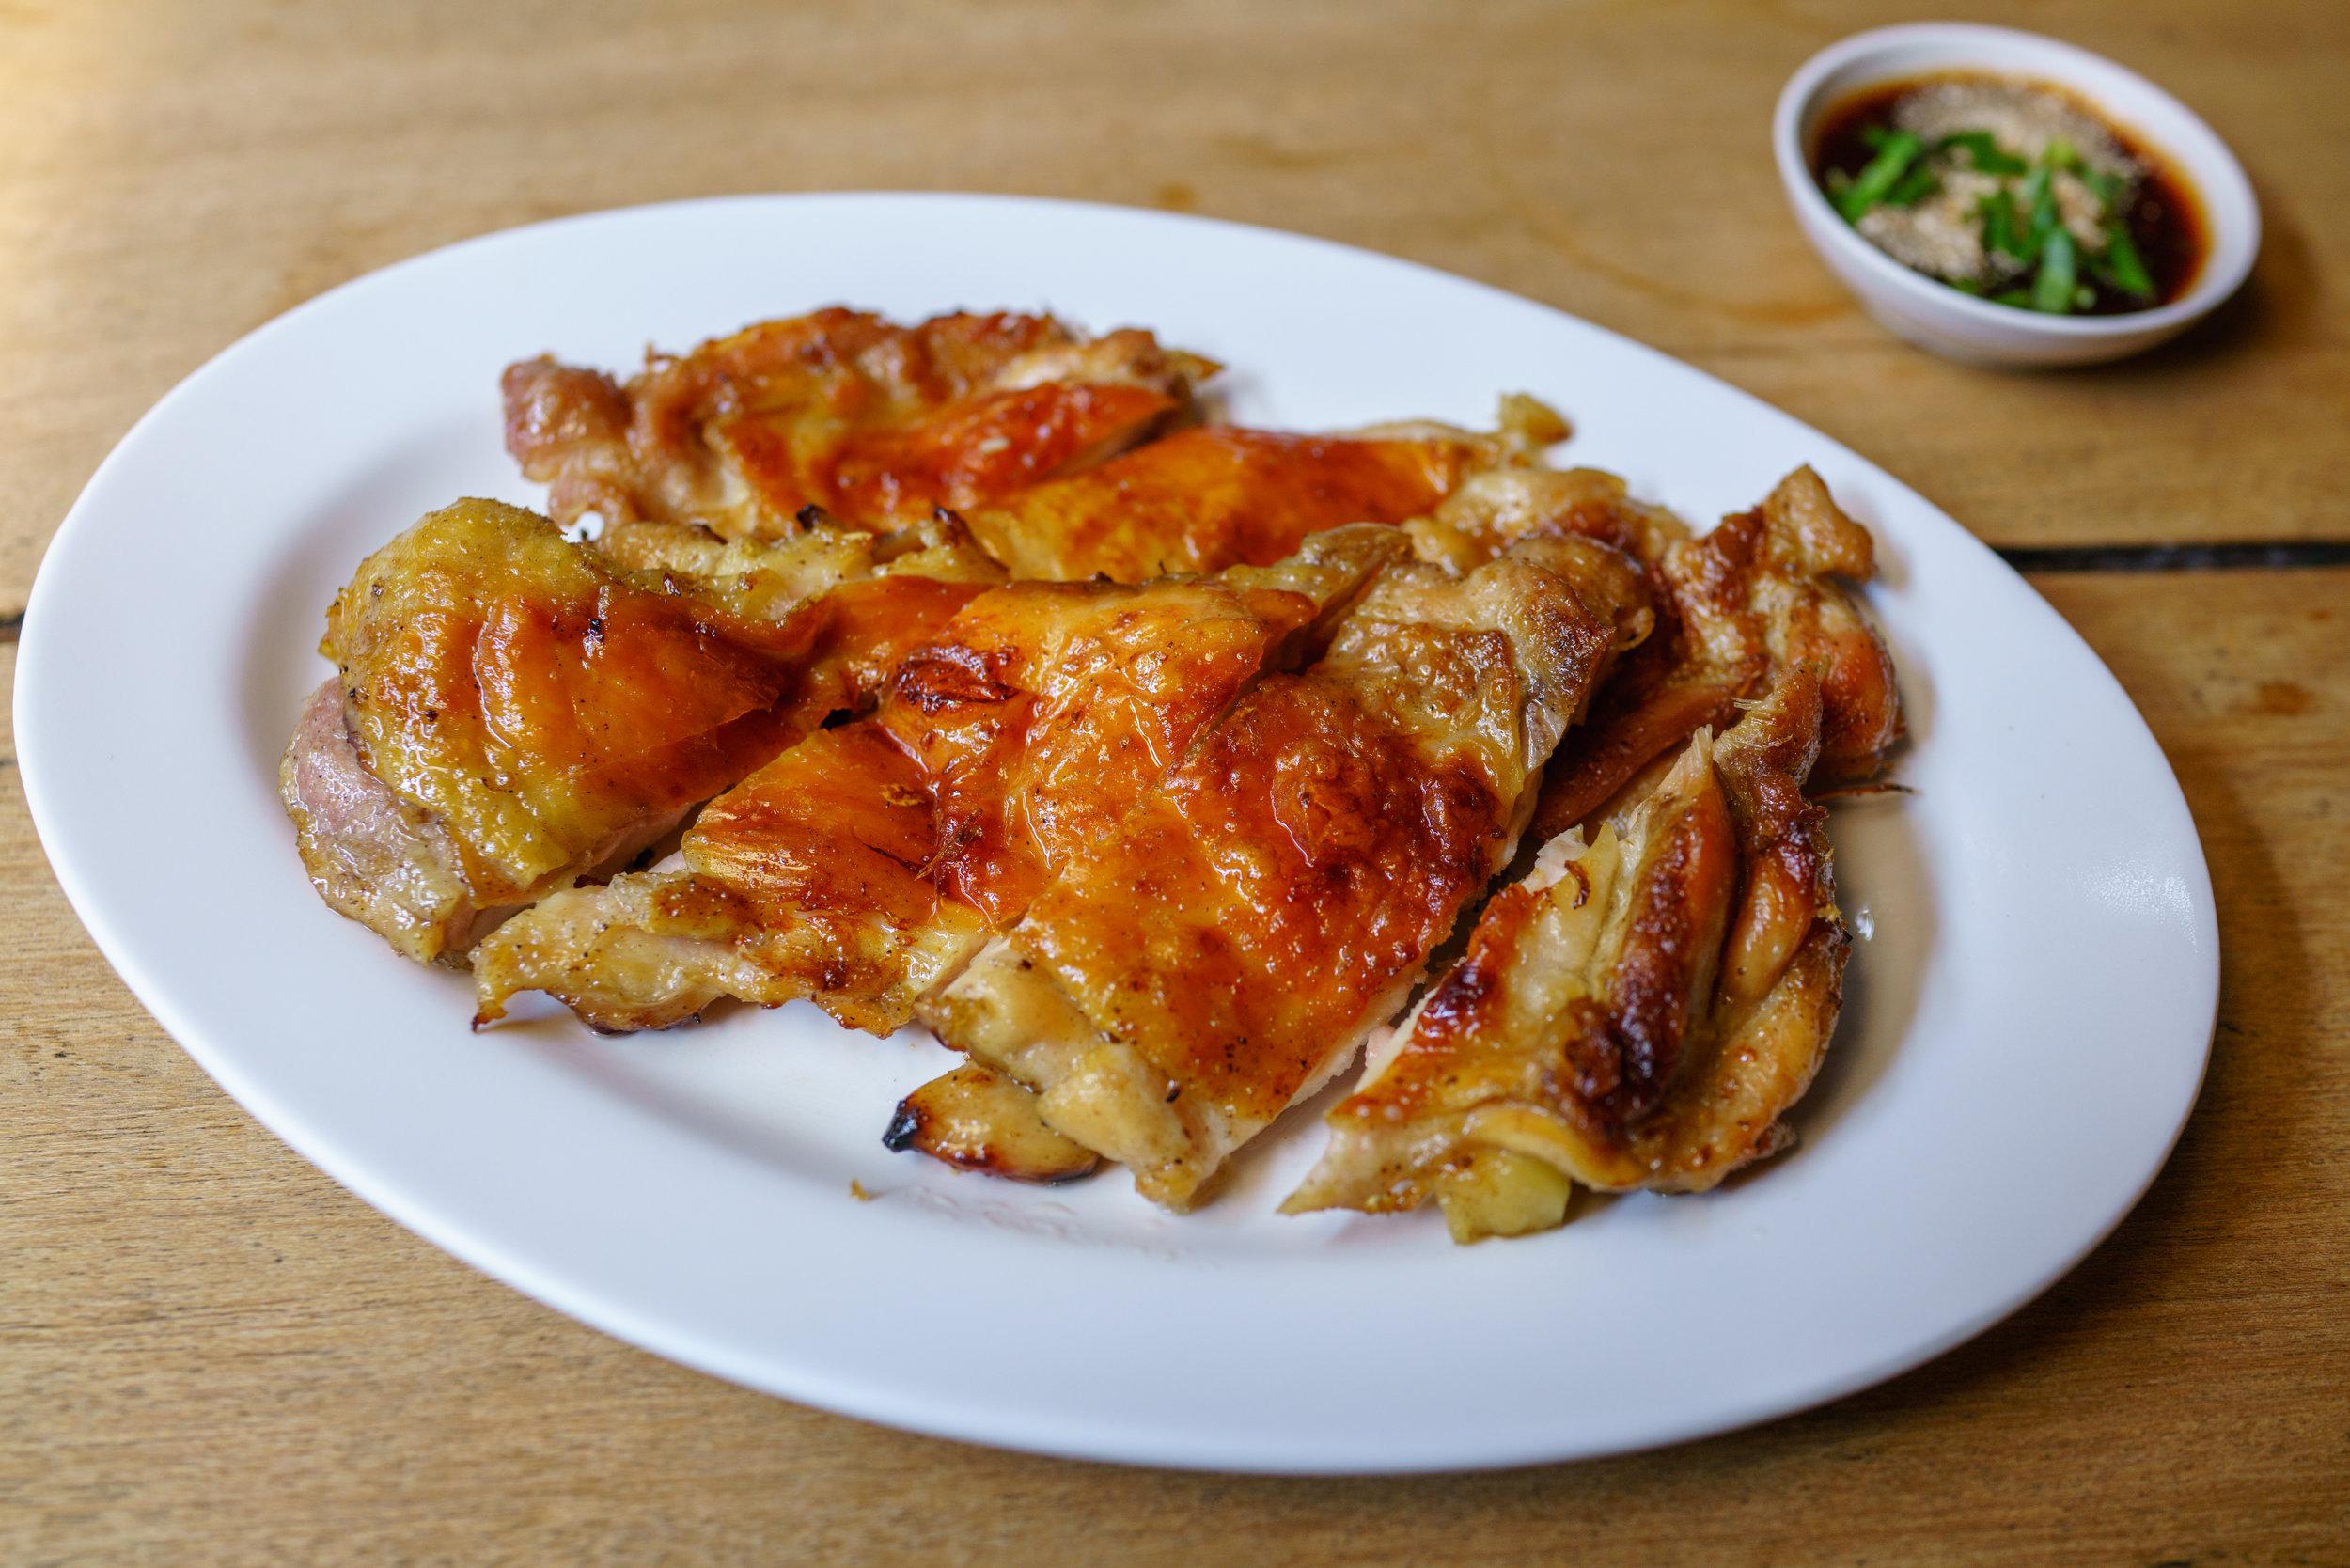 Crispy chicken with tamarind dipping sauce at Cherng Doi Roast Chicken